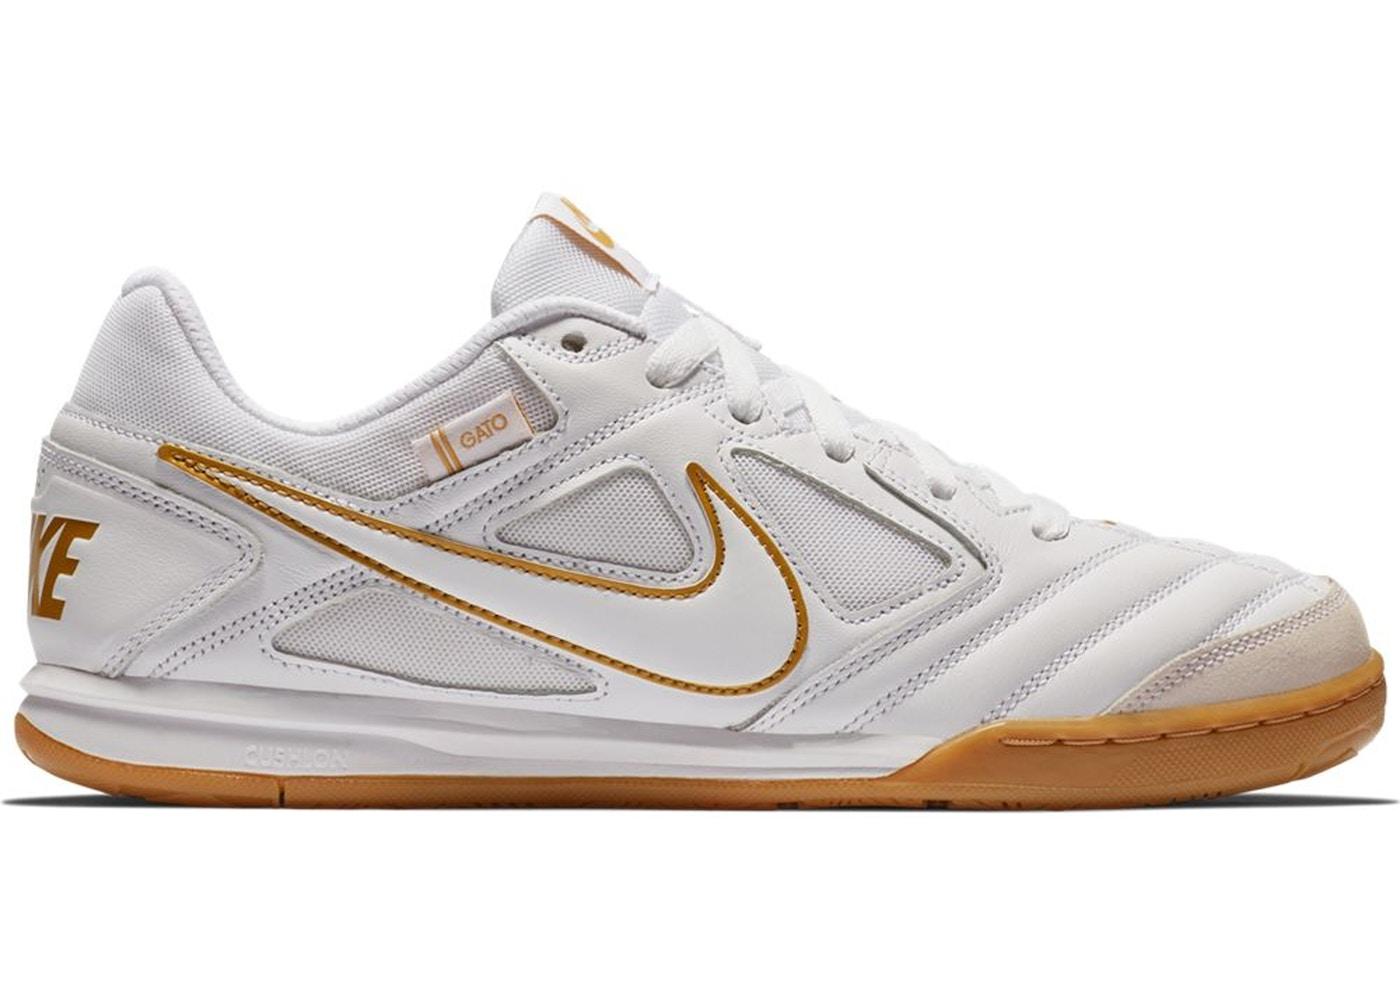 reputable site 625af 84855 Nike SB Gato White Metallic Gold